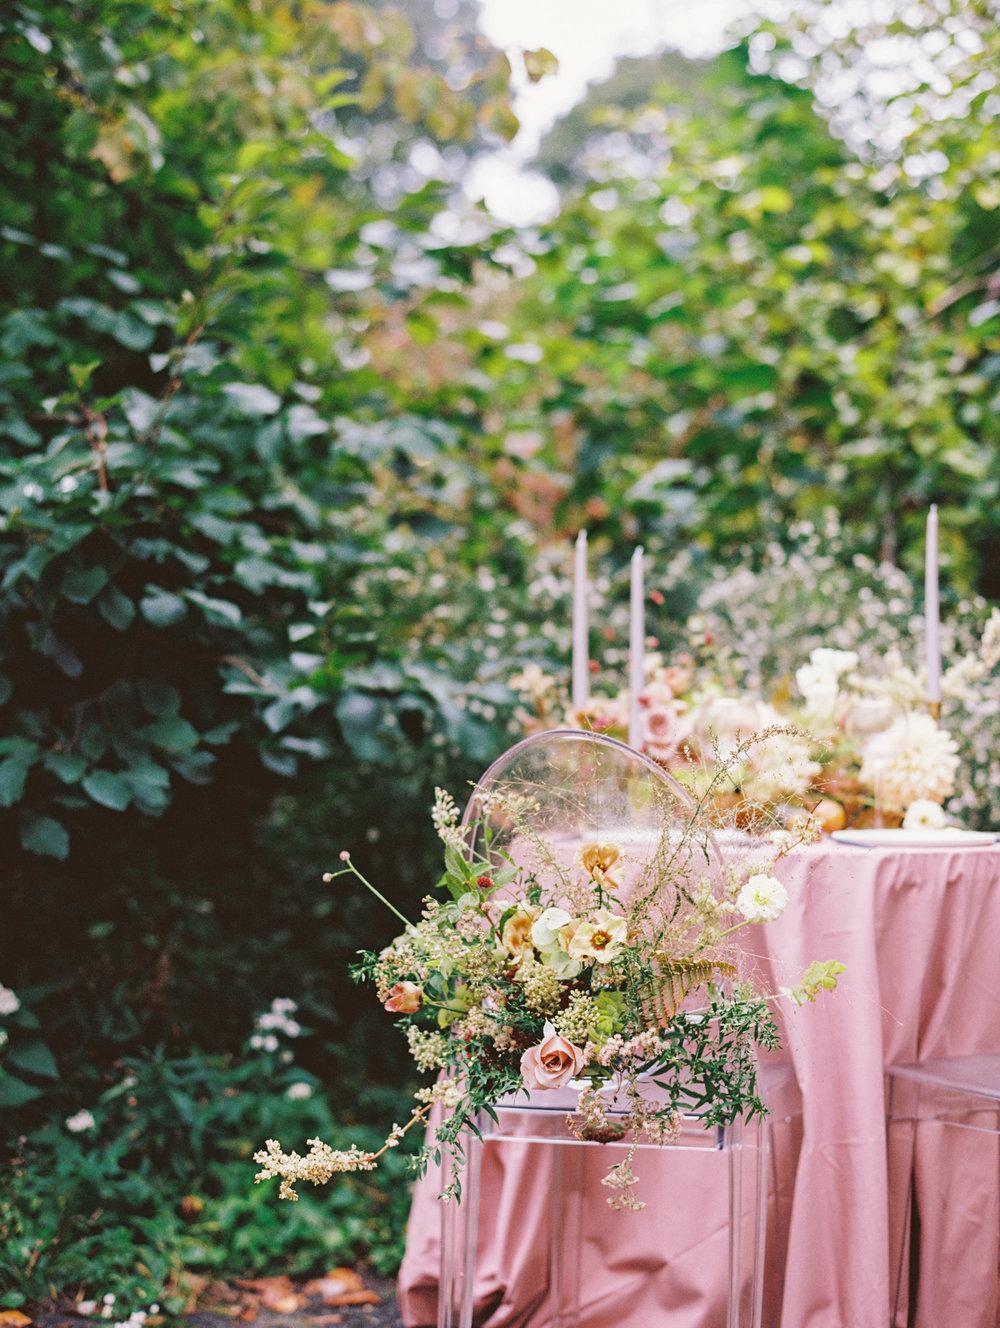 kelsandmichael_bridaleditorial_harvestelopement-8.jpg